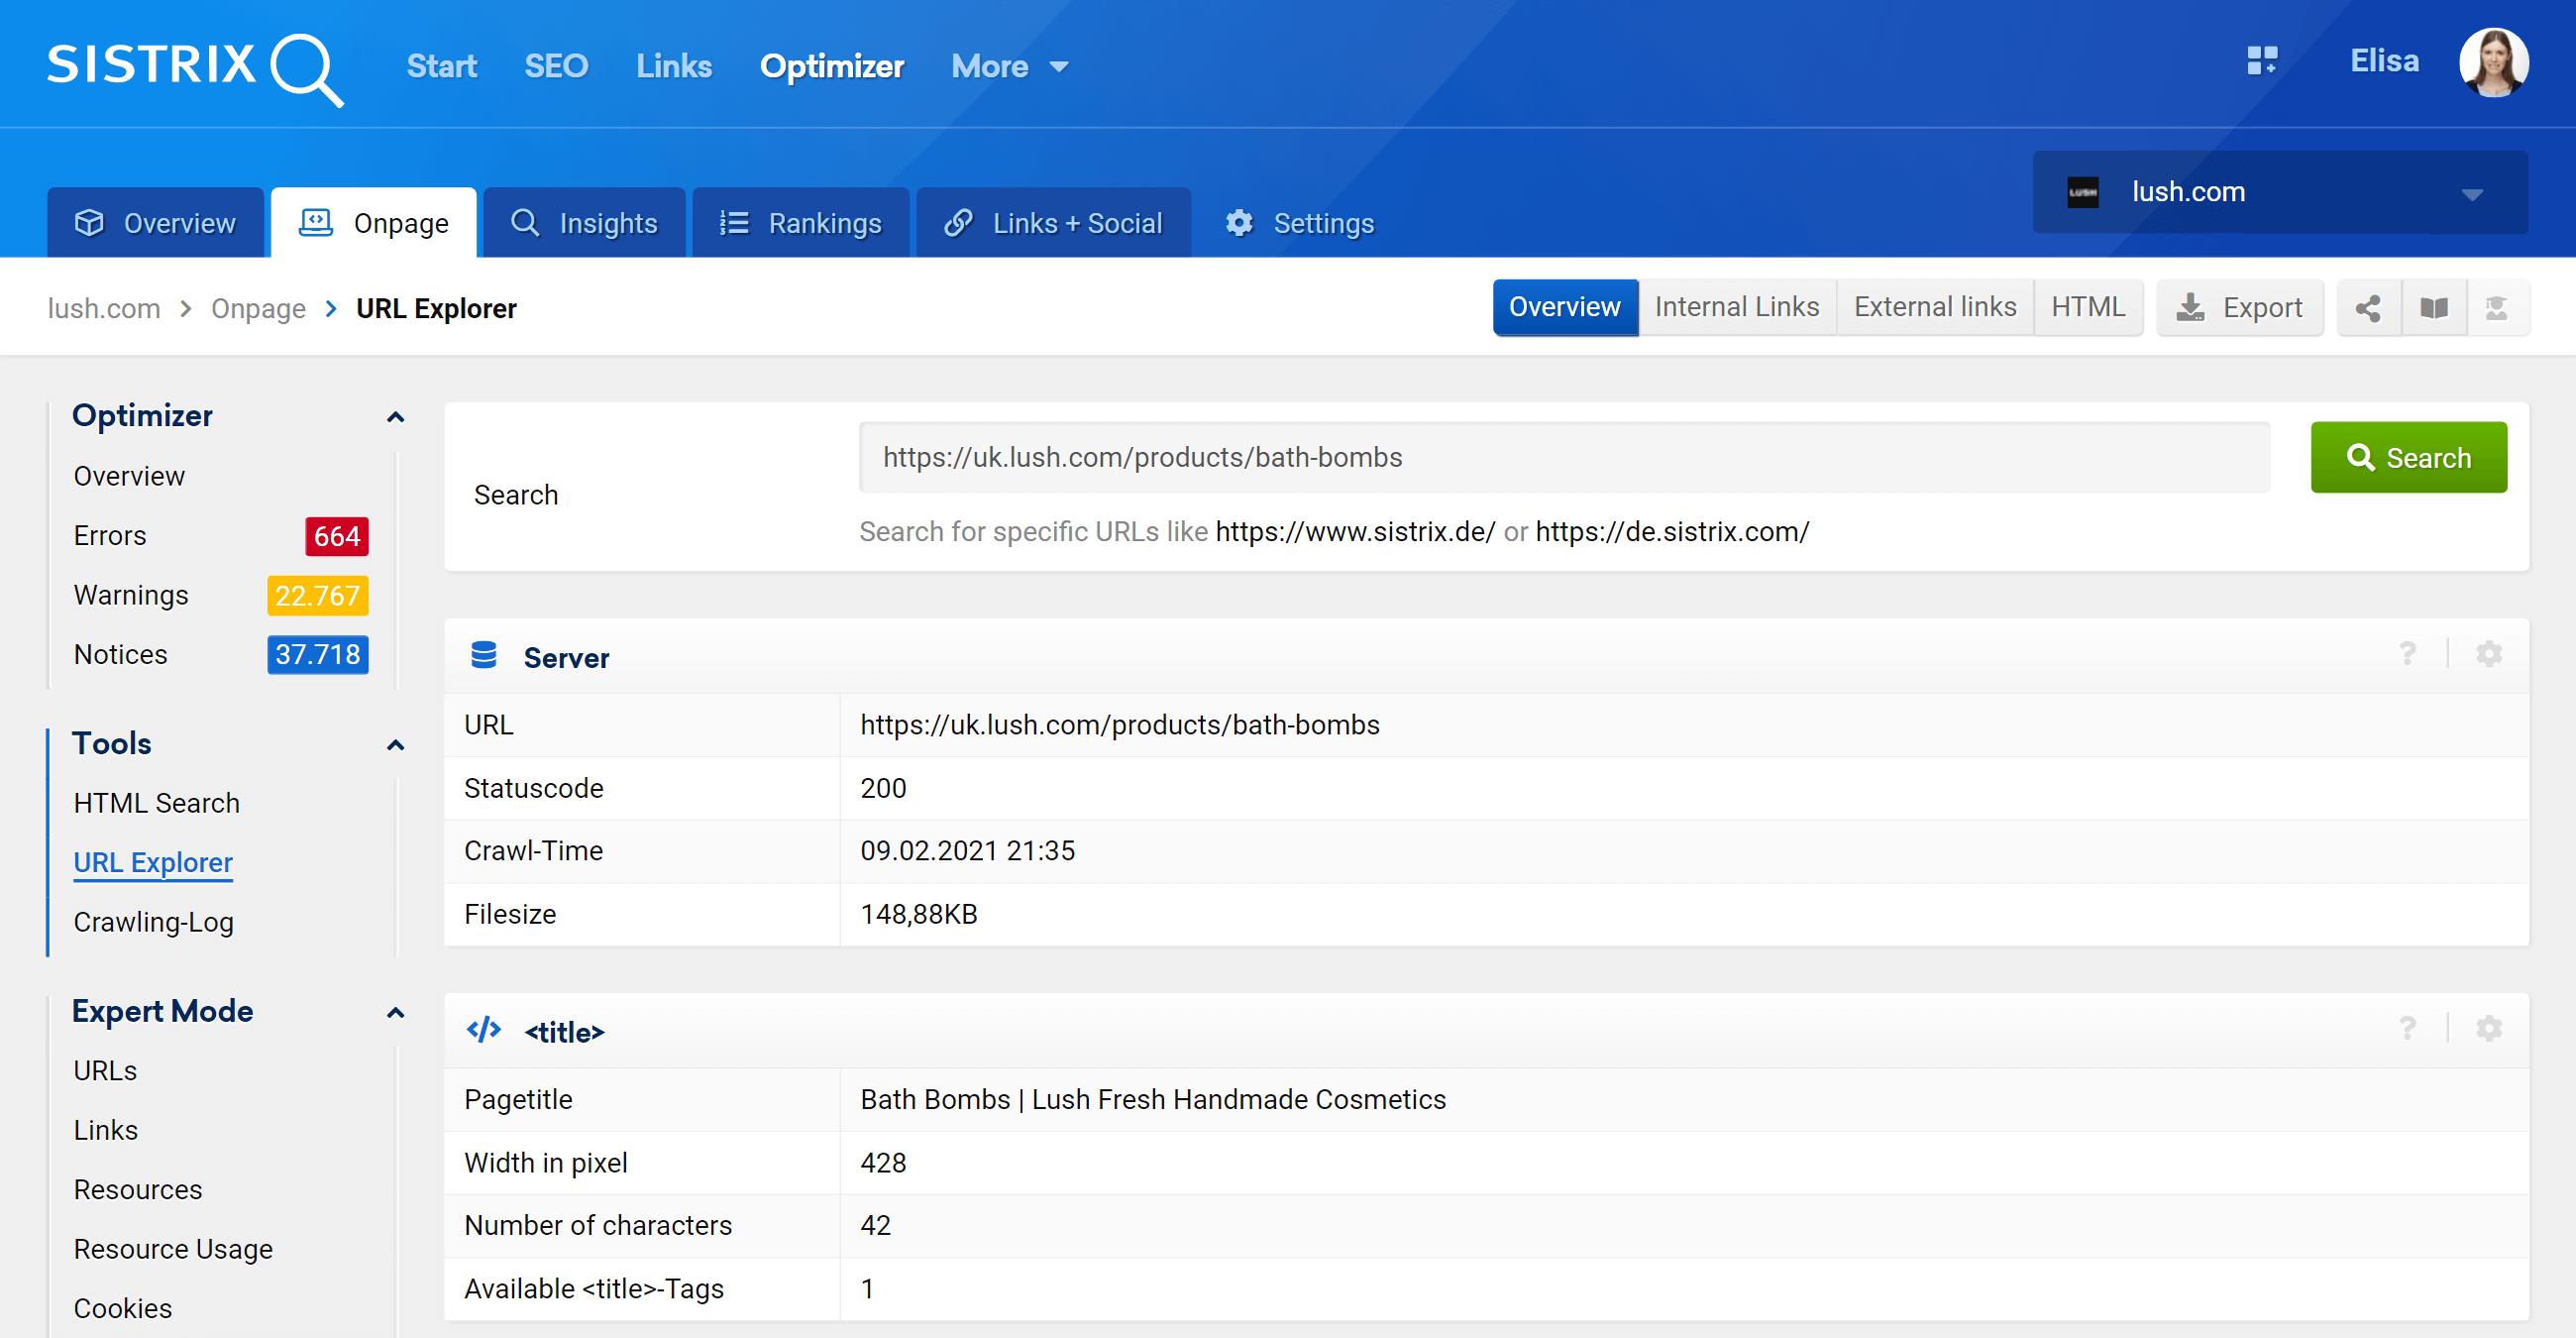 URL-Explorer in the Optimizer